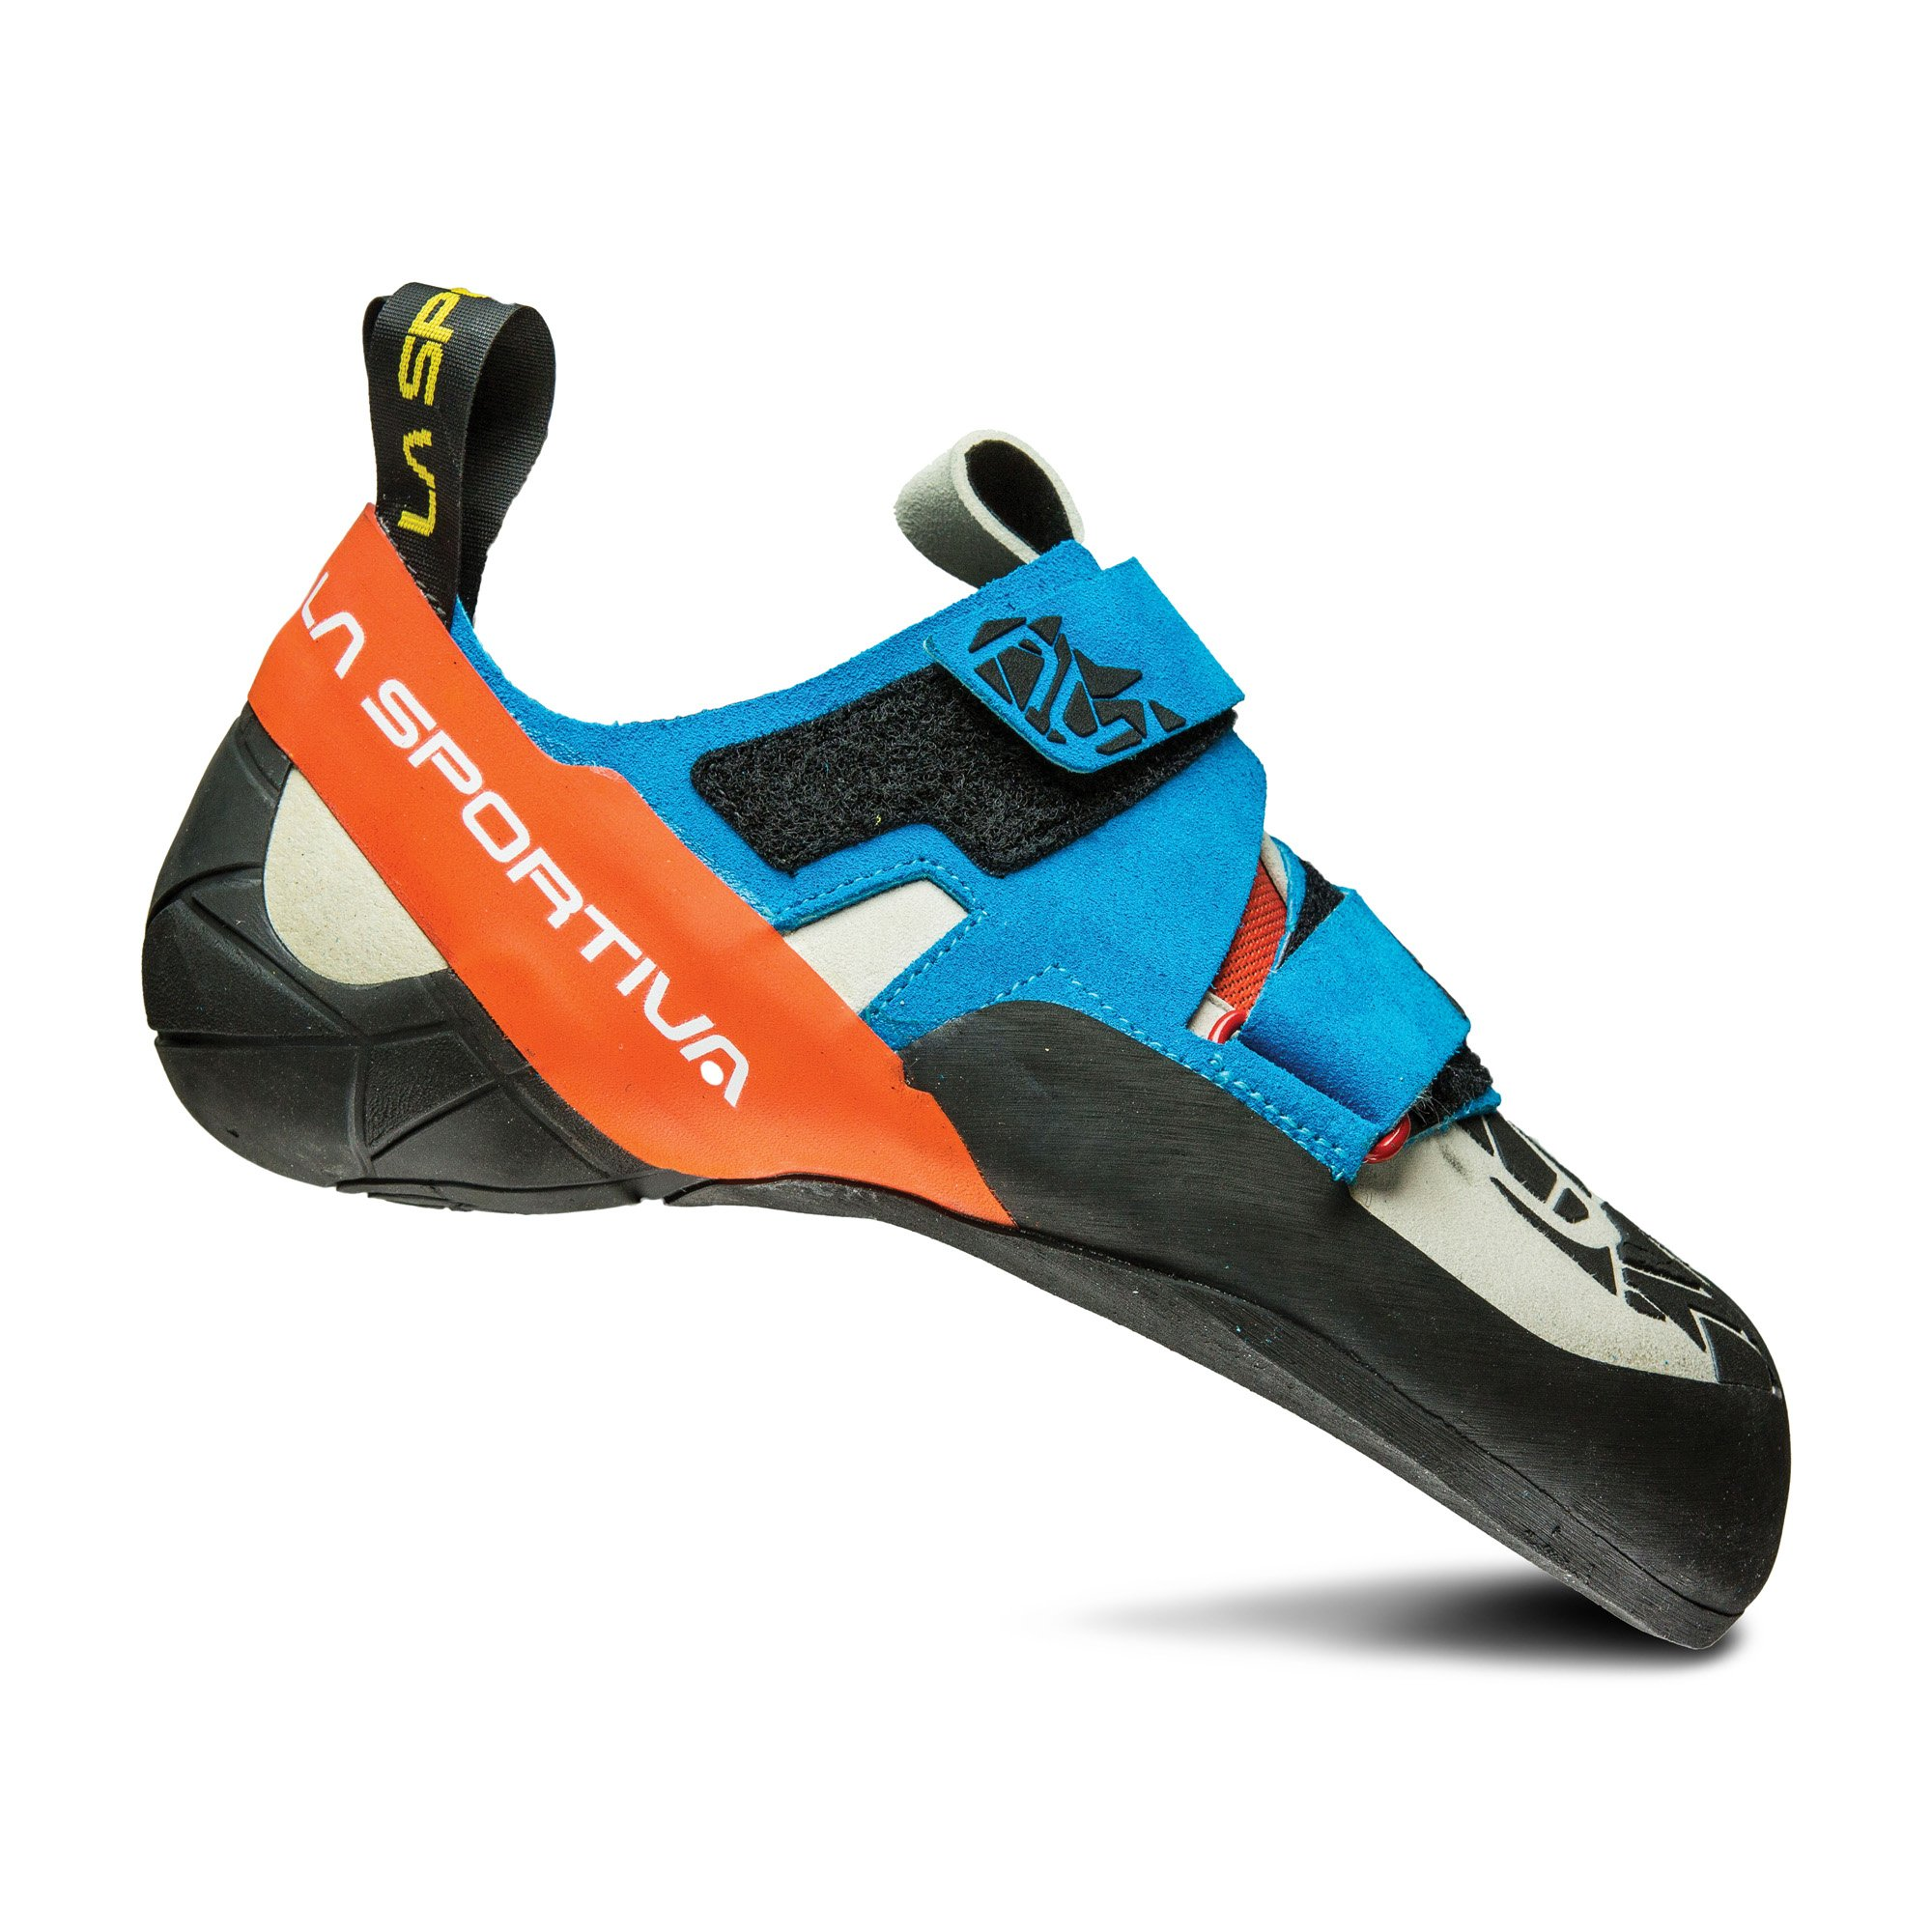 La Sportiva OTAKI Climbing Shoe, Blue/Flame, 42.5